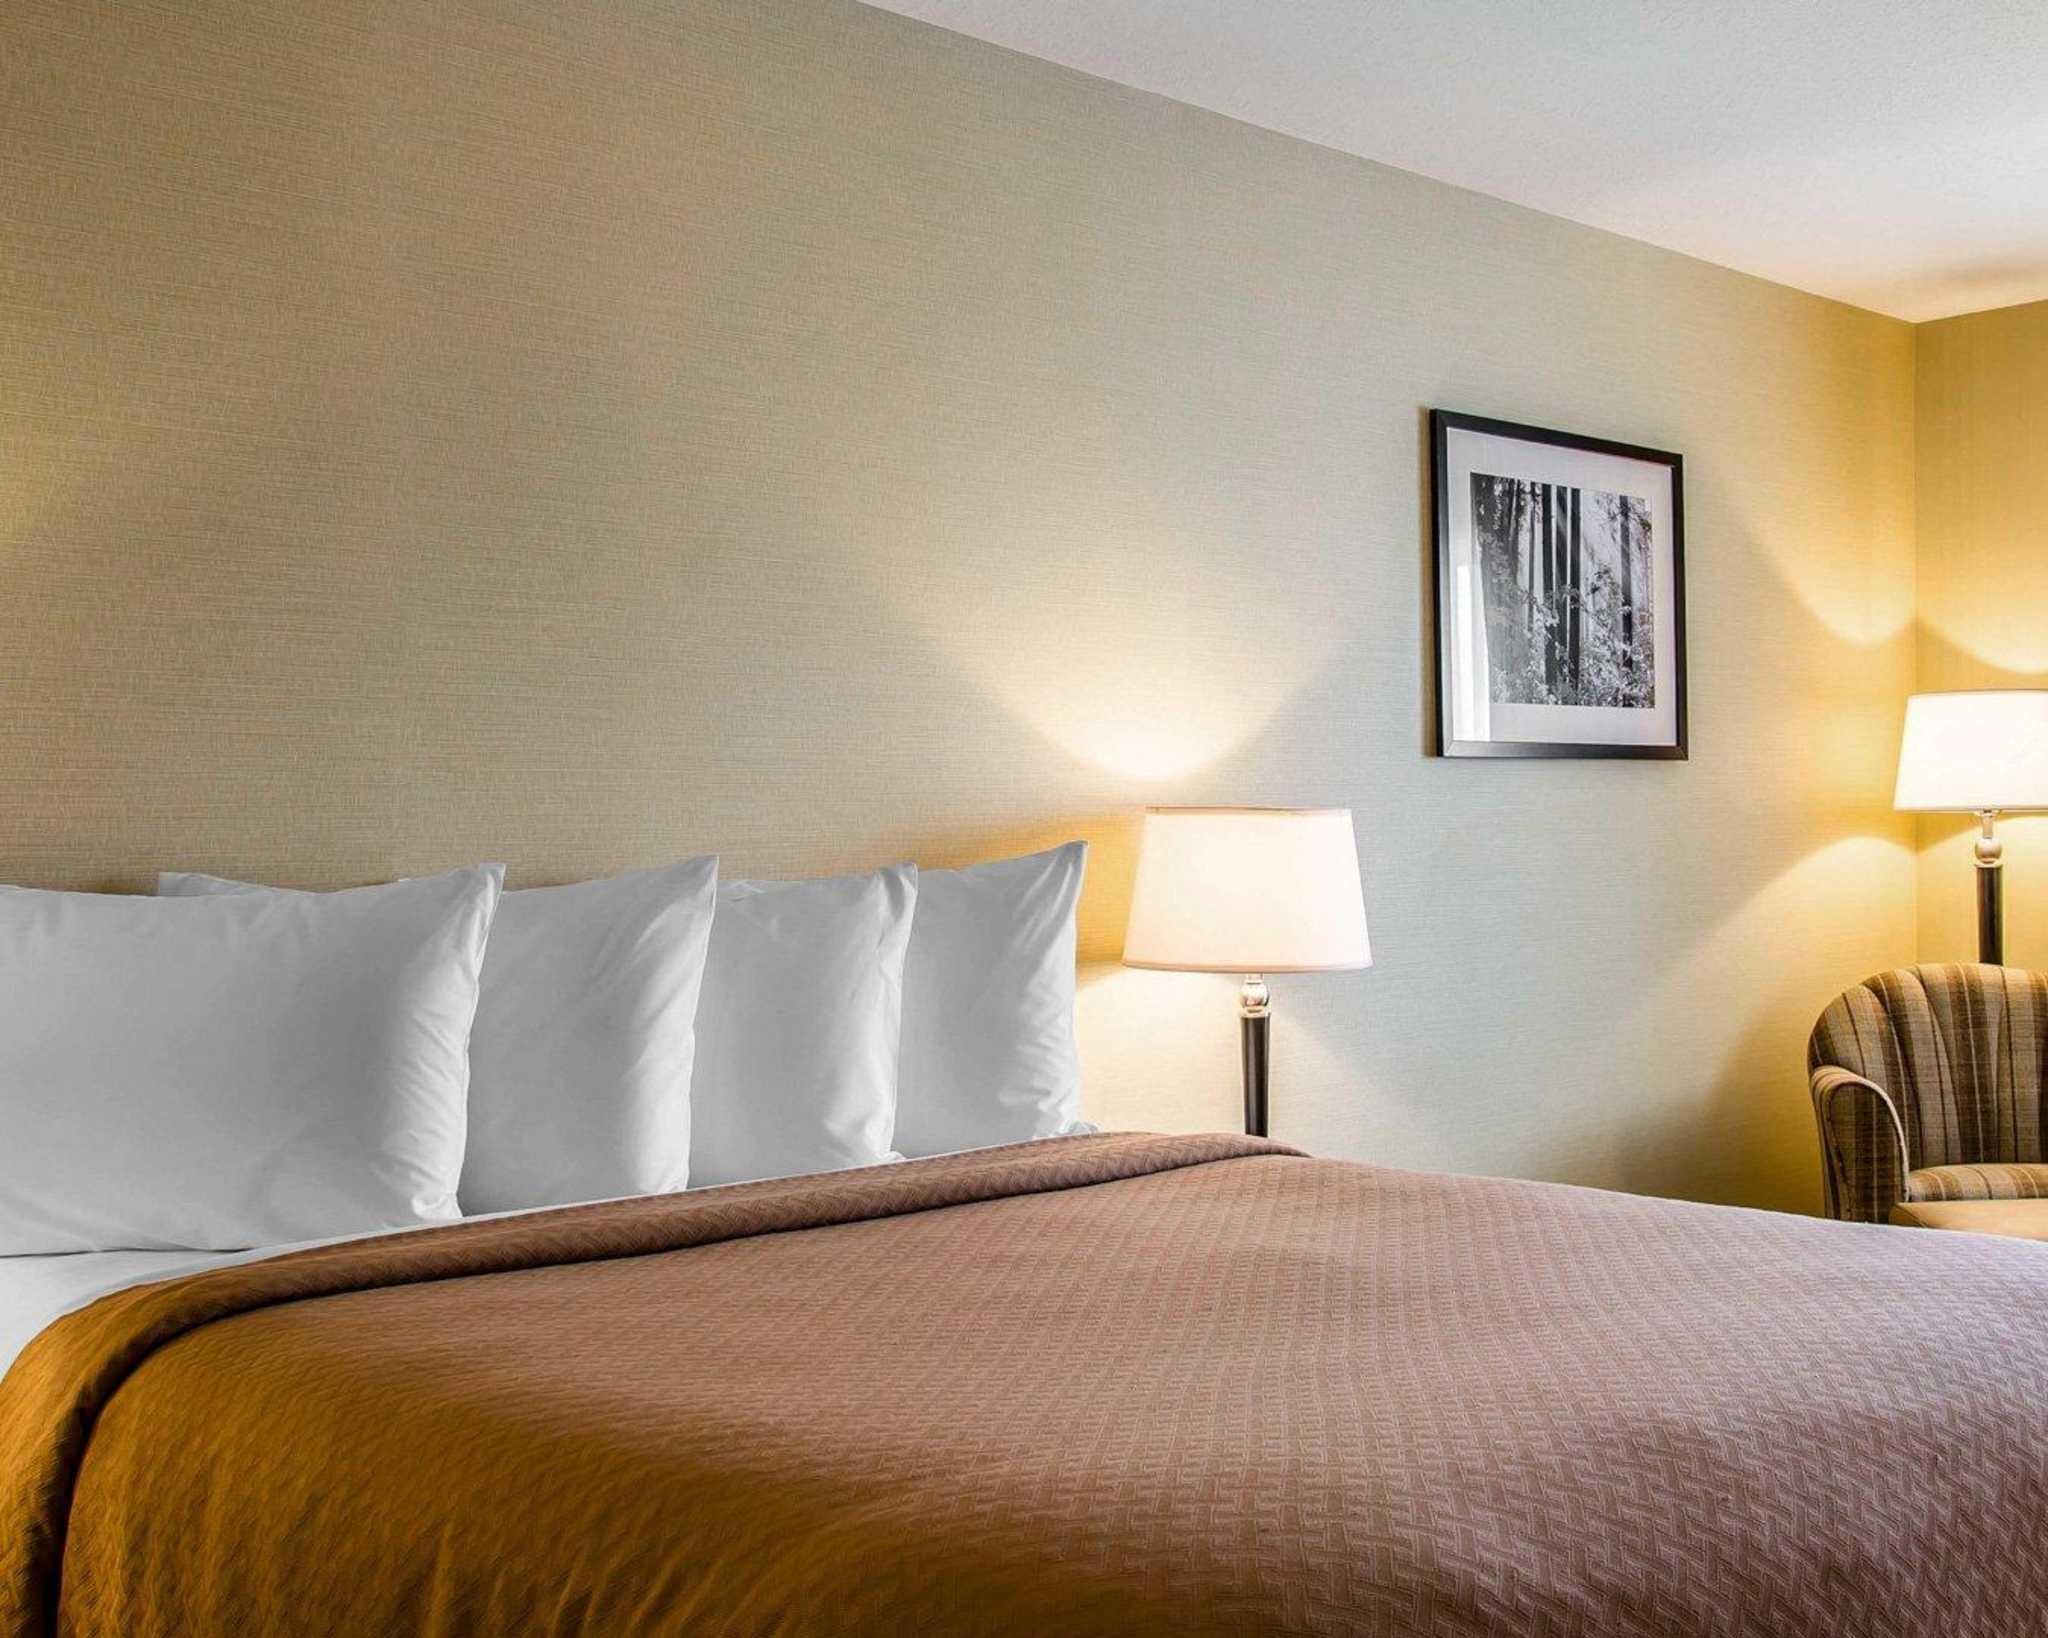 Hotel Rooms In Rexburg Idaho